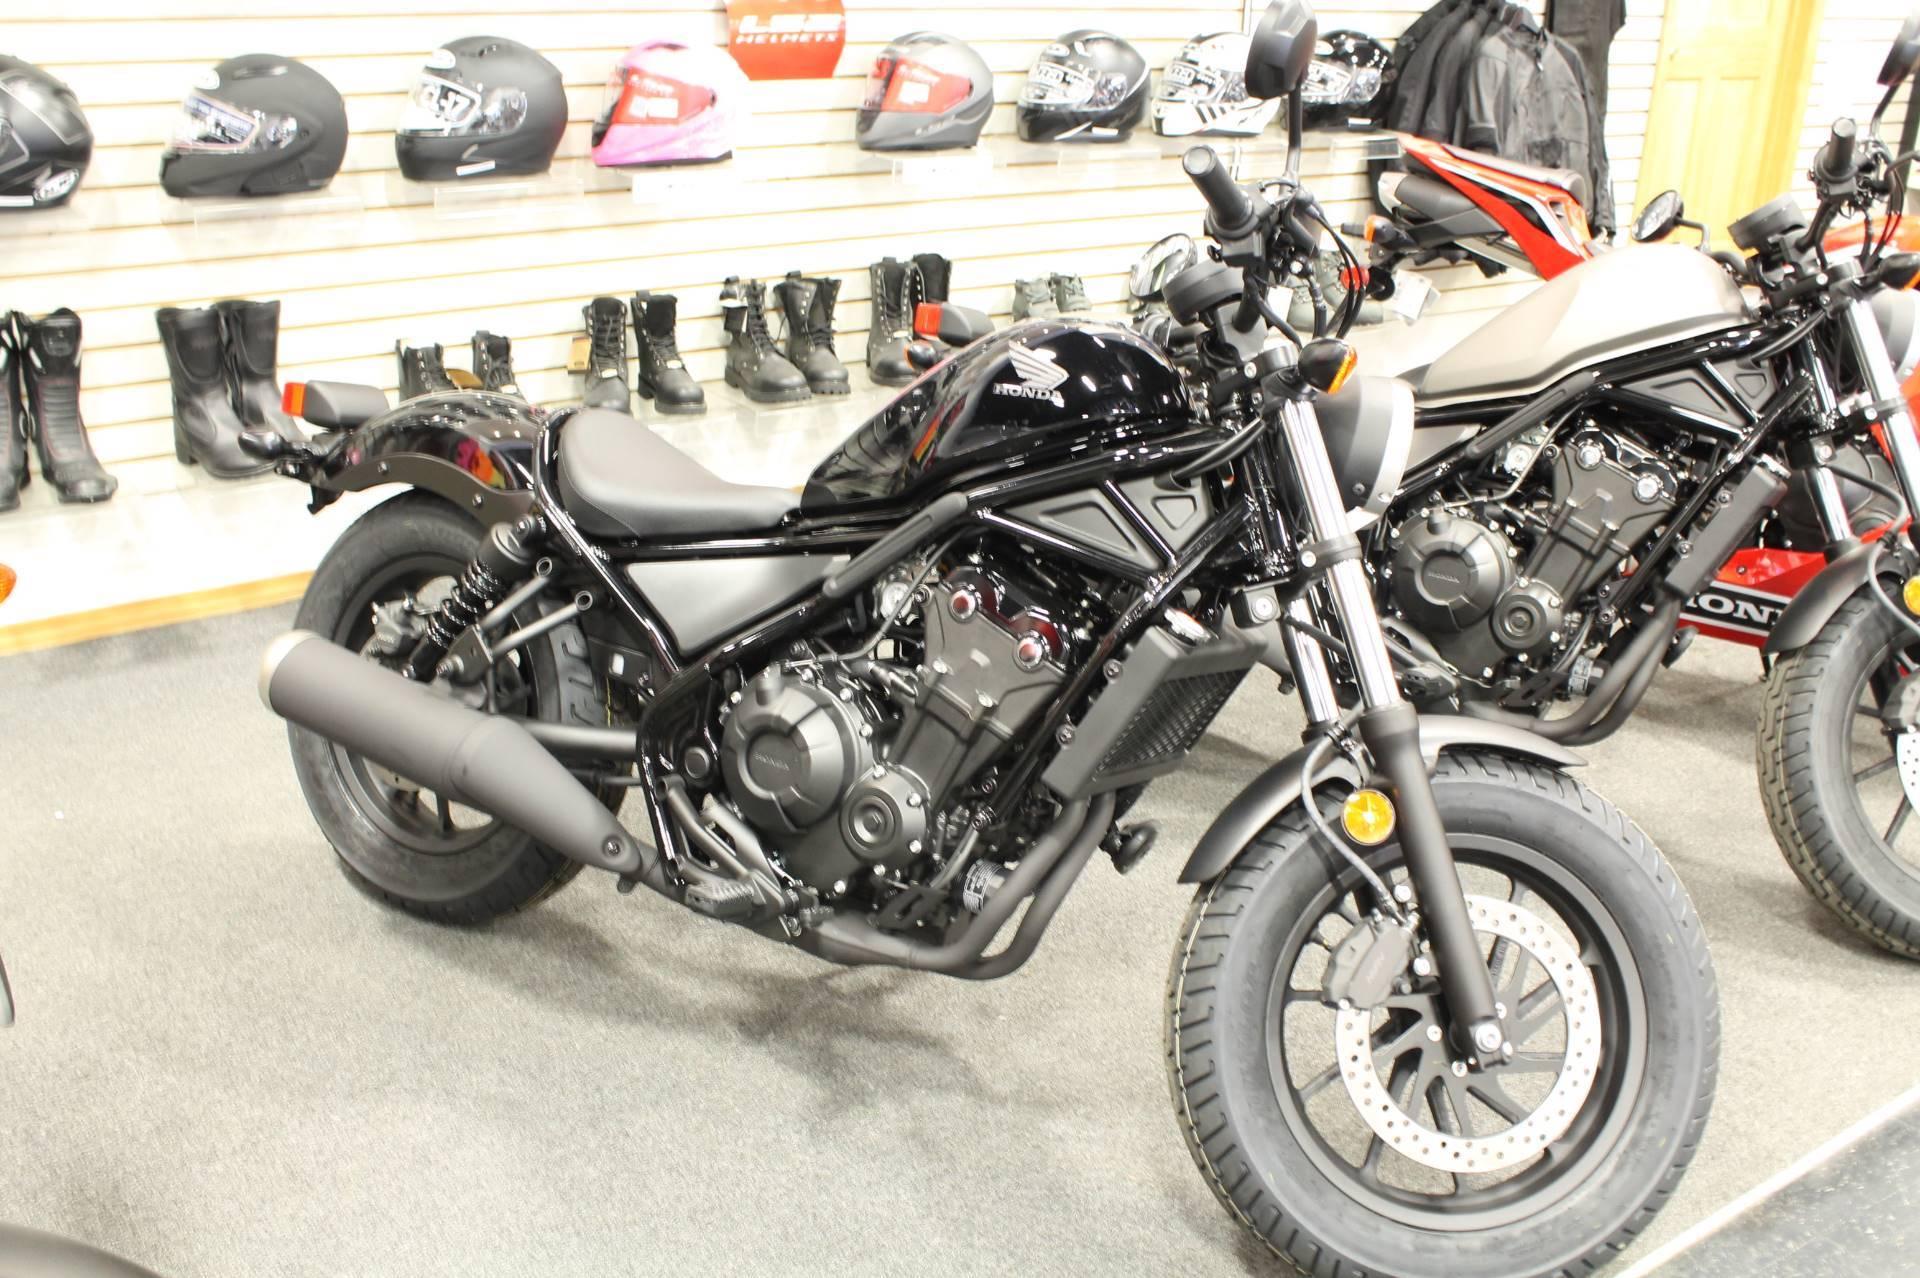 New 2018 Honda Rebel 500 Motorcycles In Adams Ma Stock Number 101764